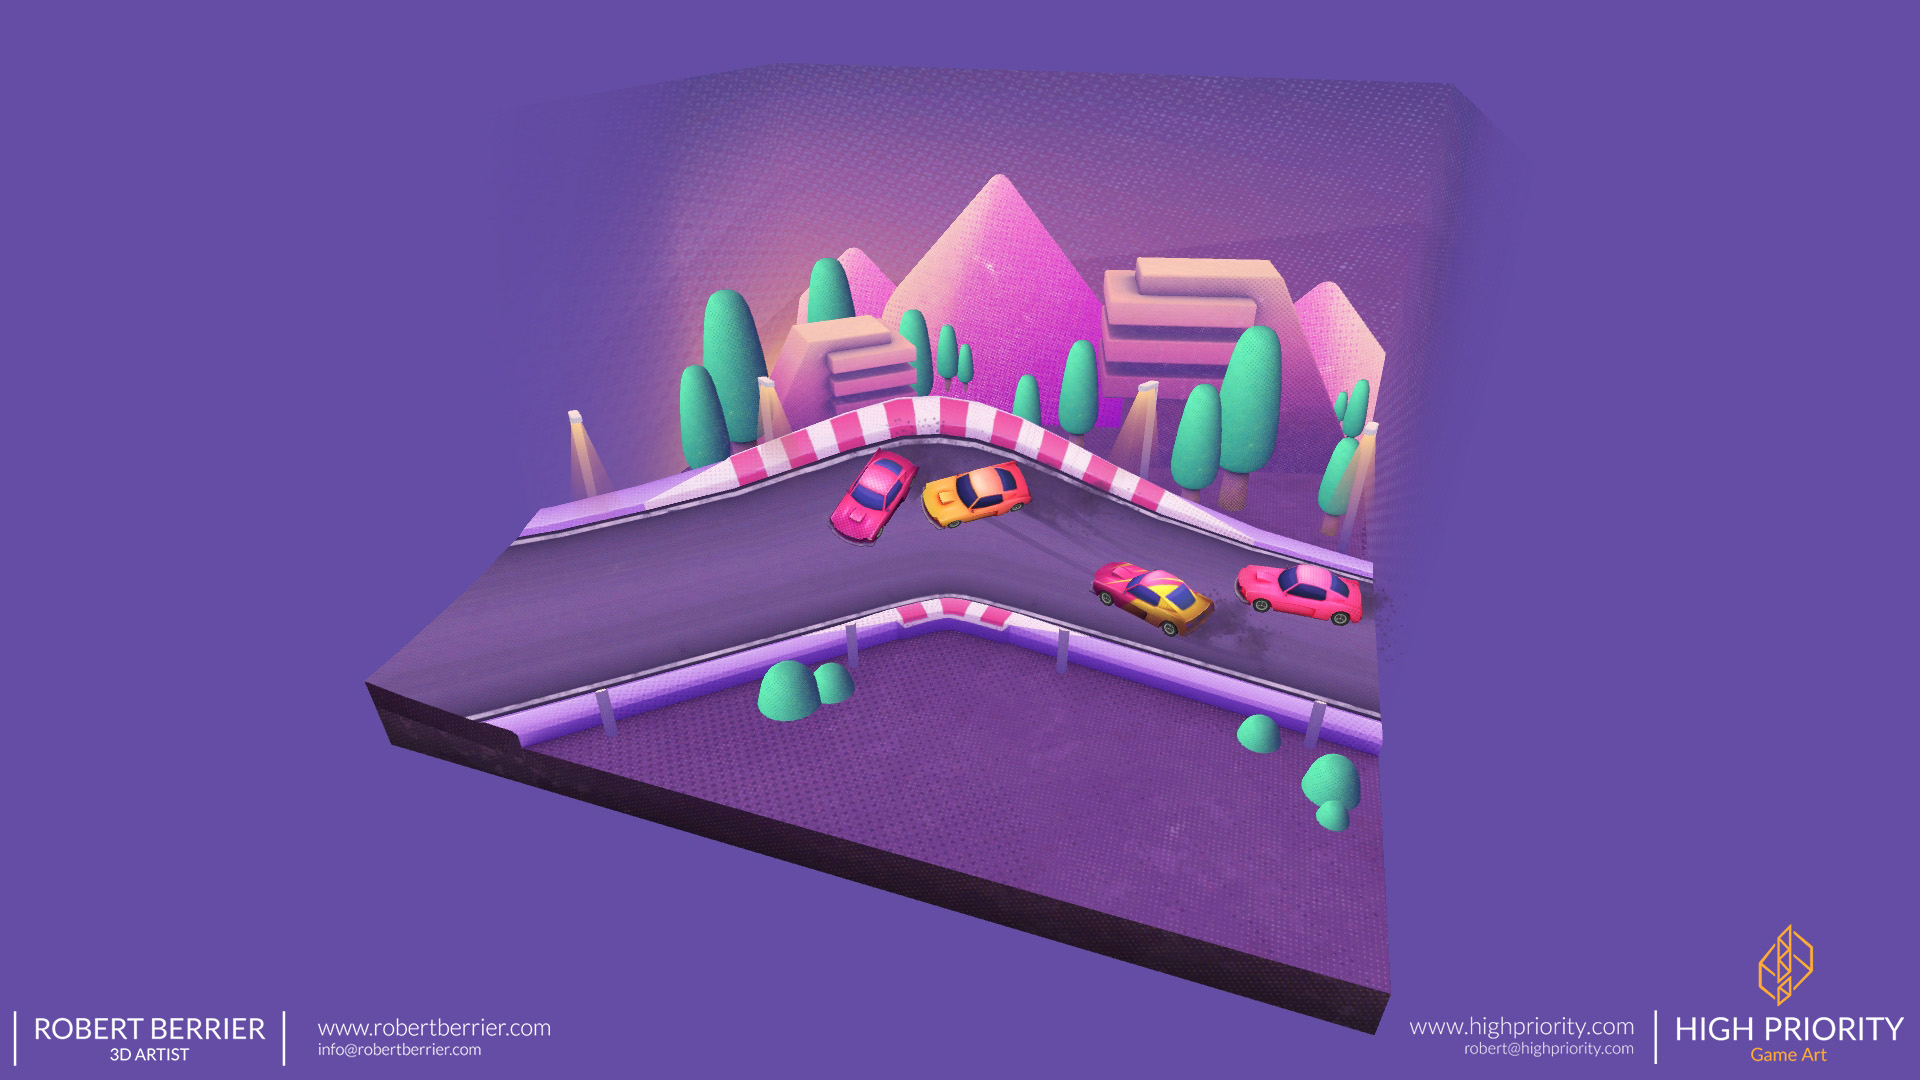 High Priority - Racer Make Way - Environment 01